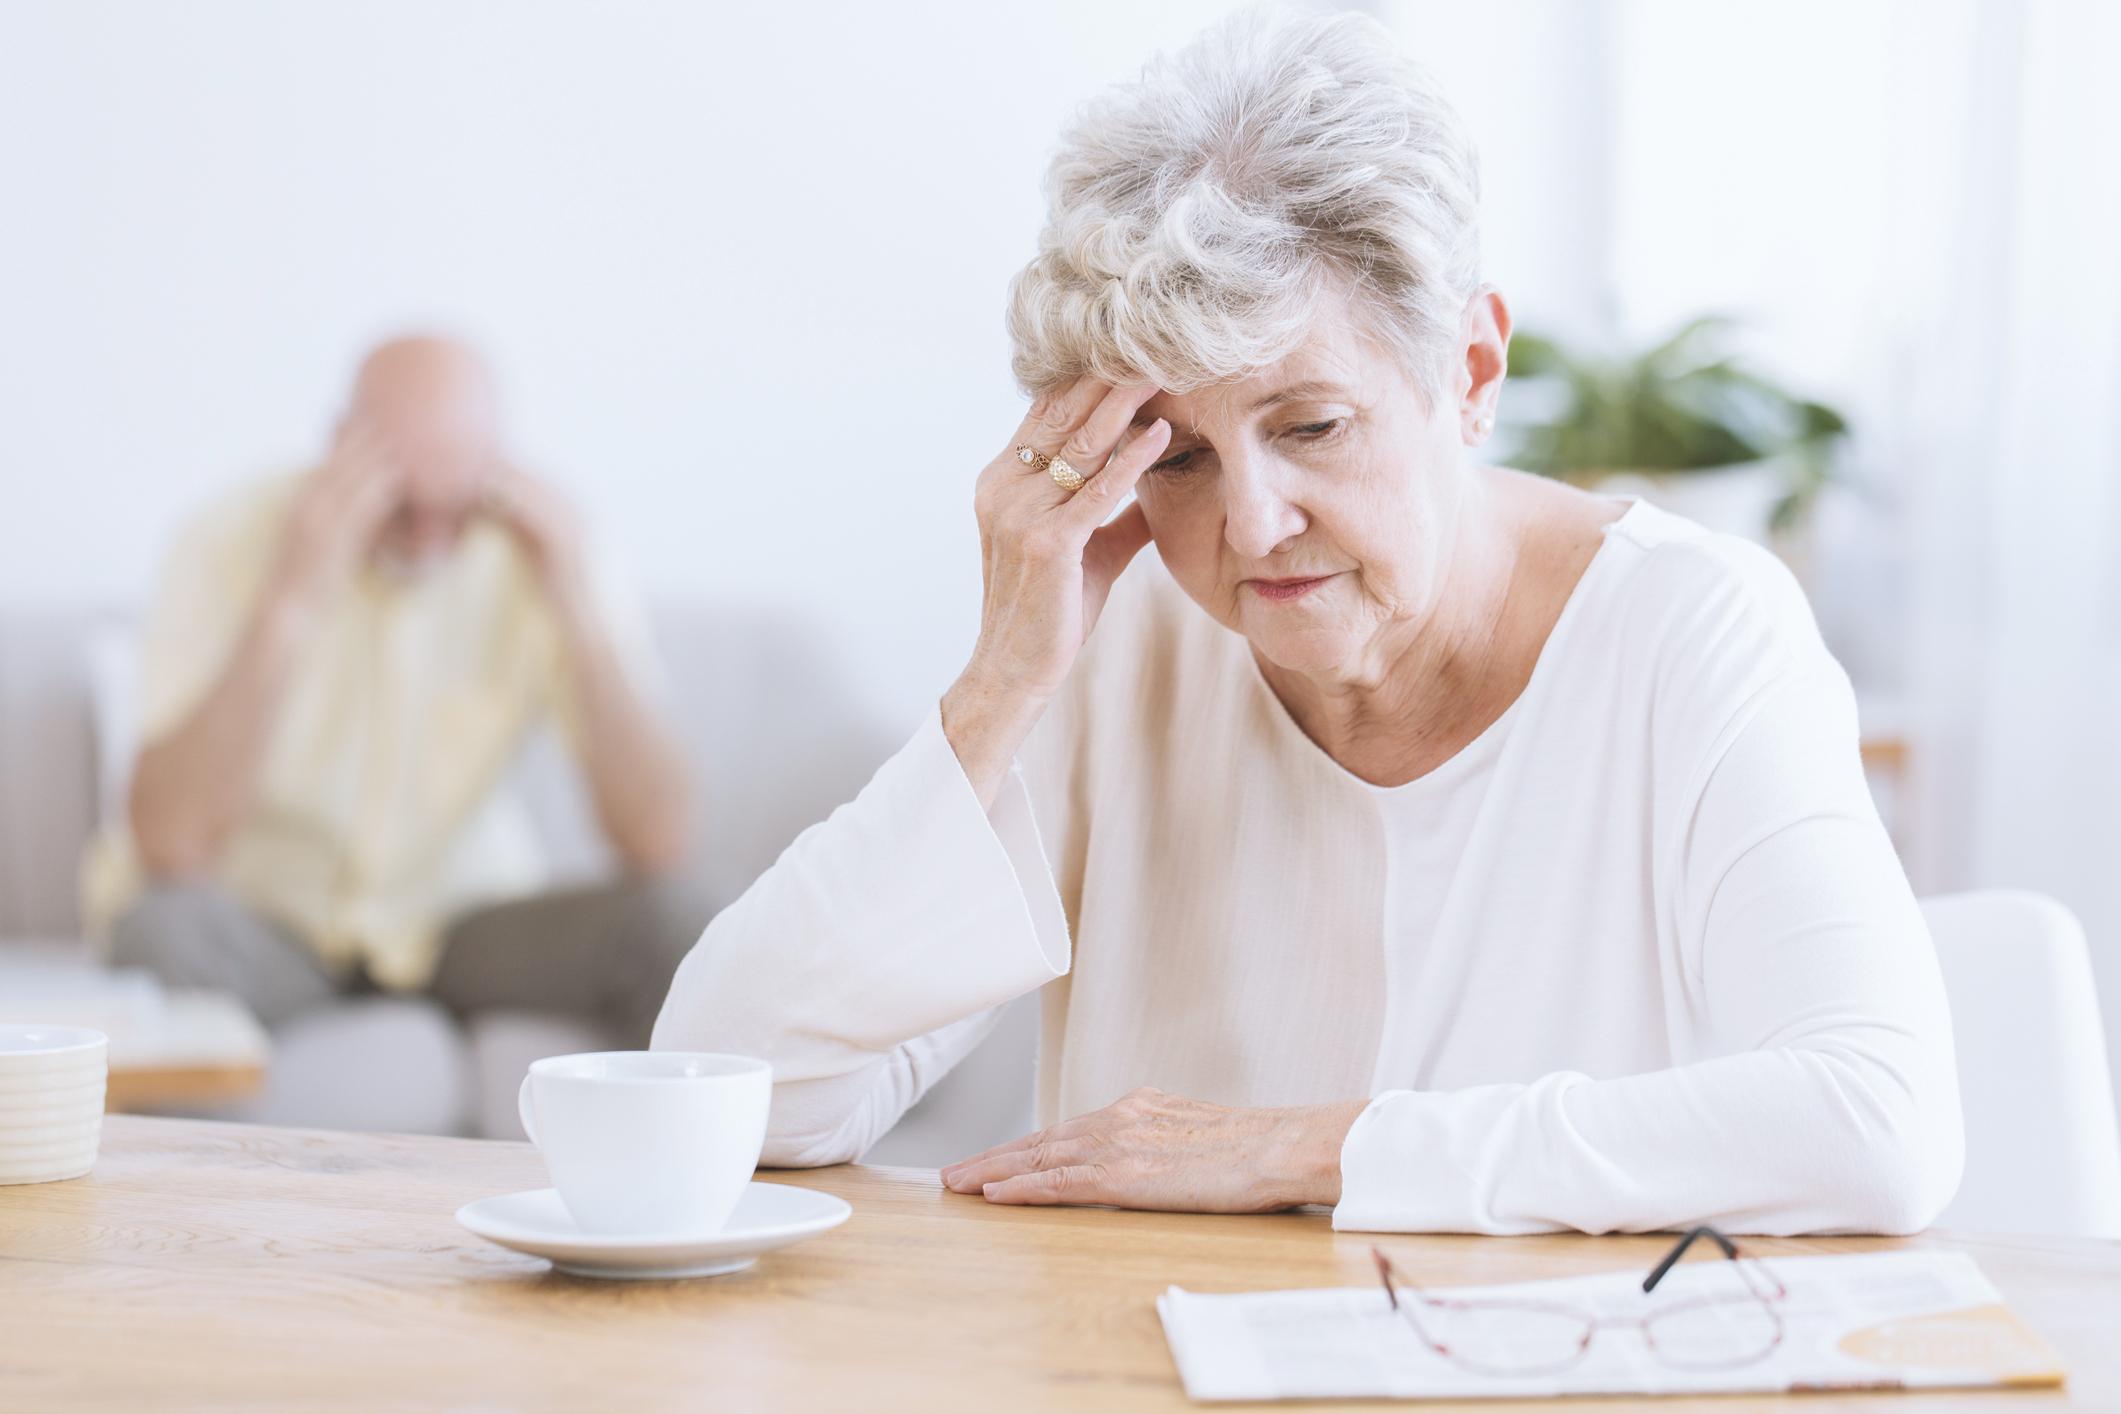 Sad senior woman sitting at desk.